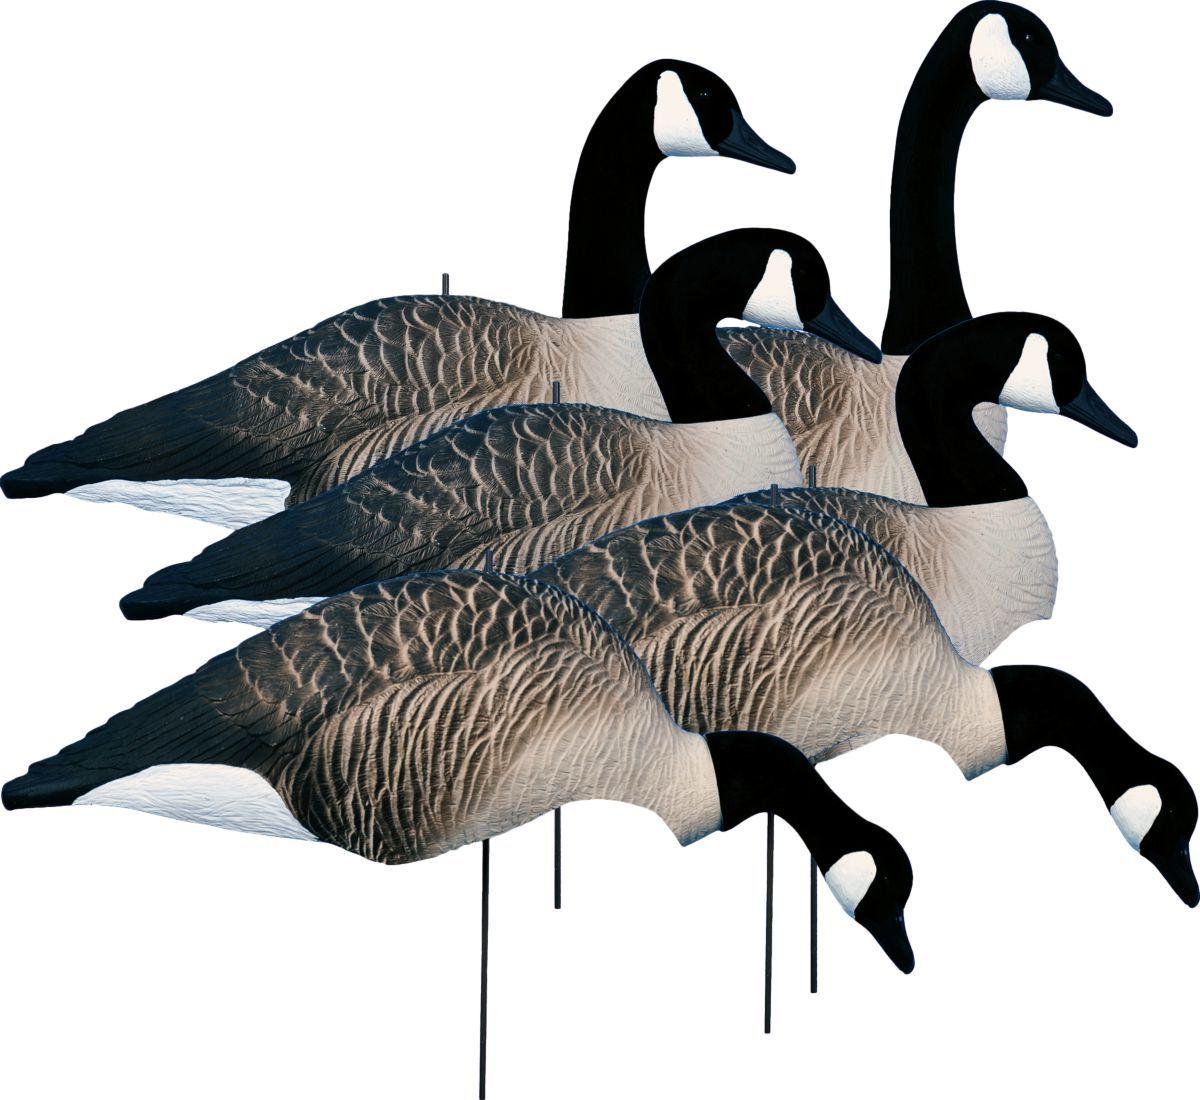 Higdon Outdoors Alpha Wobbler Goose Decoys